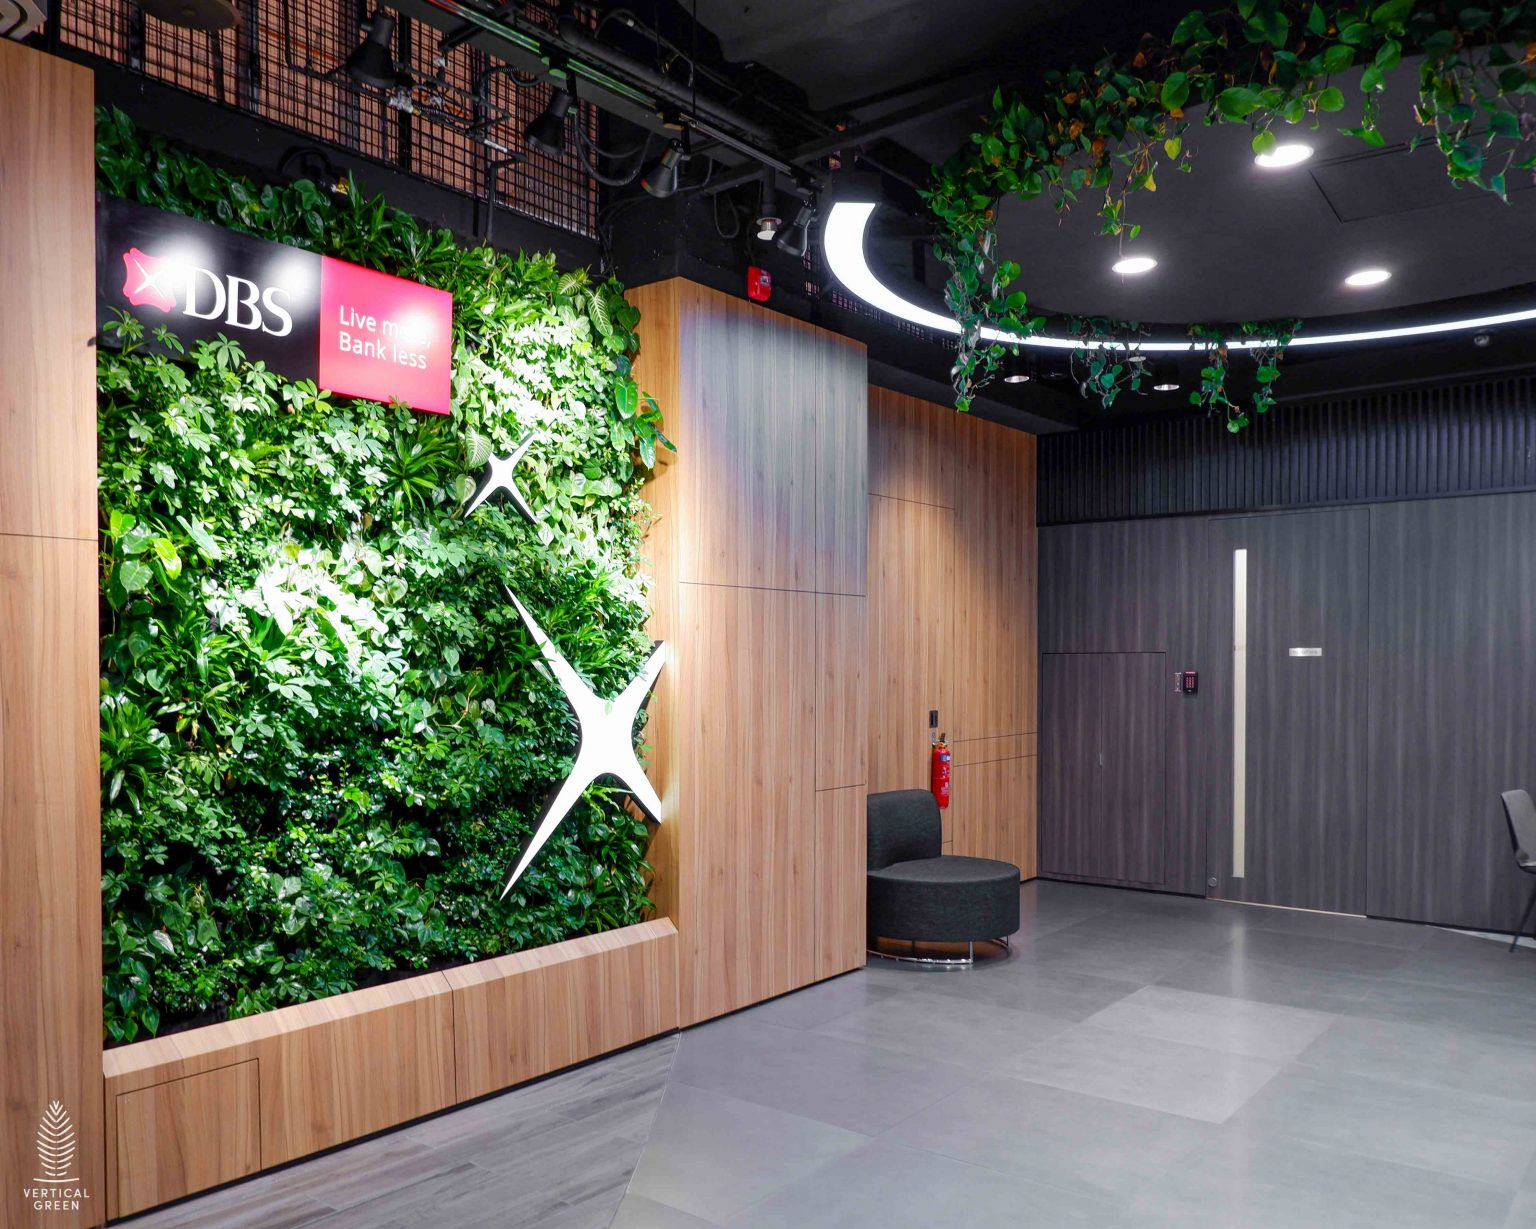 Curved Live green wall indoor office @ DBS Bank Takashimaya branch Singapore